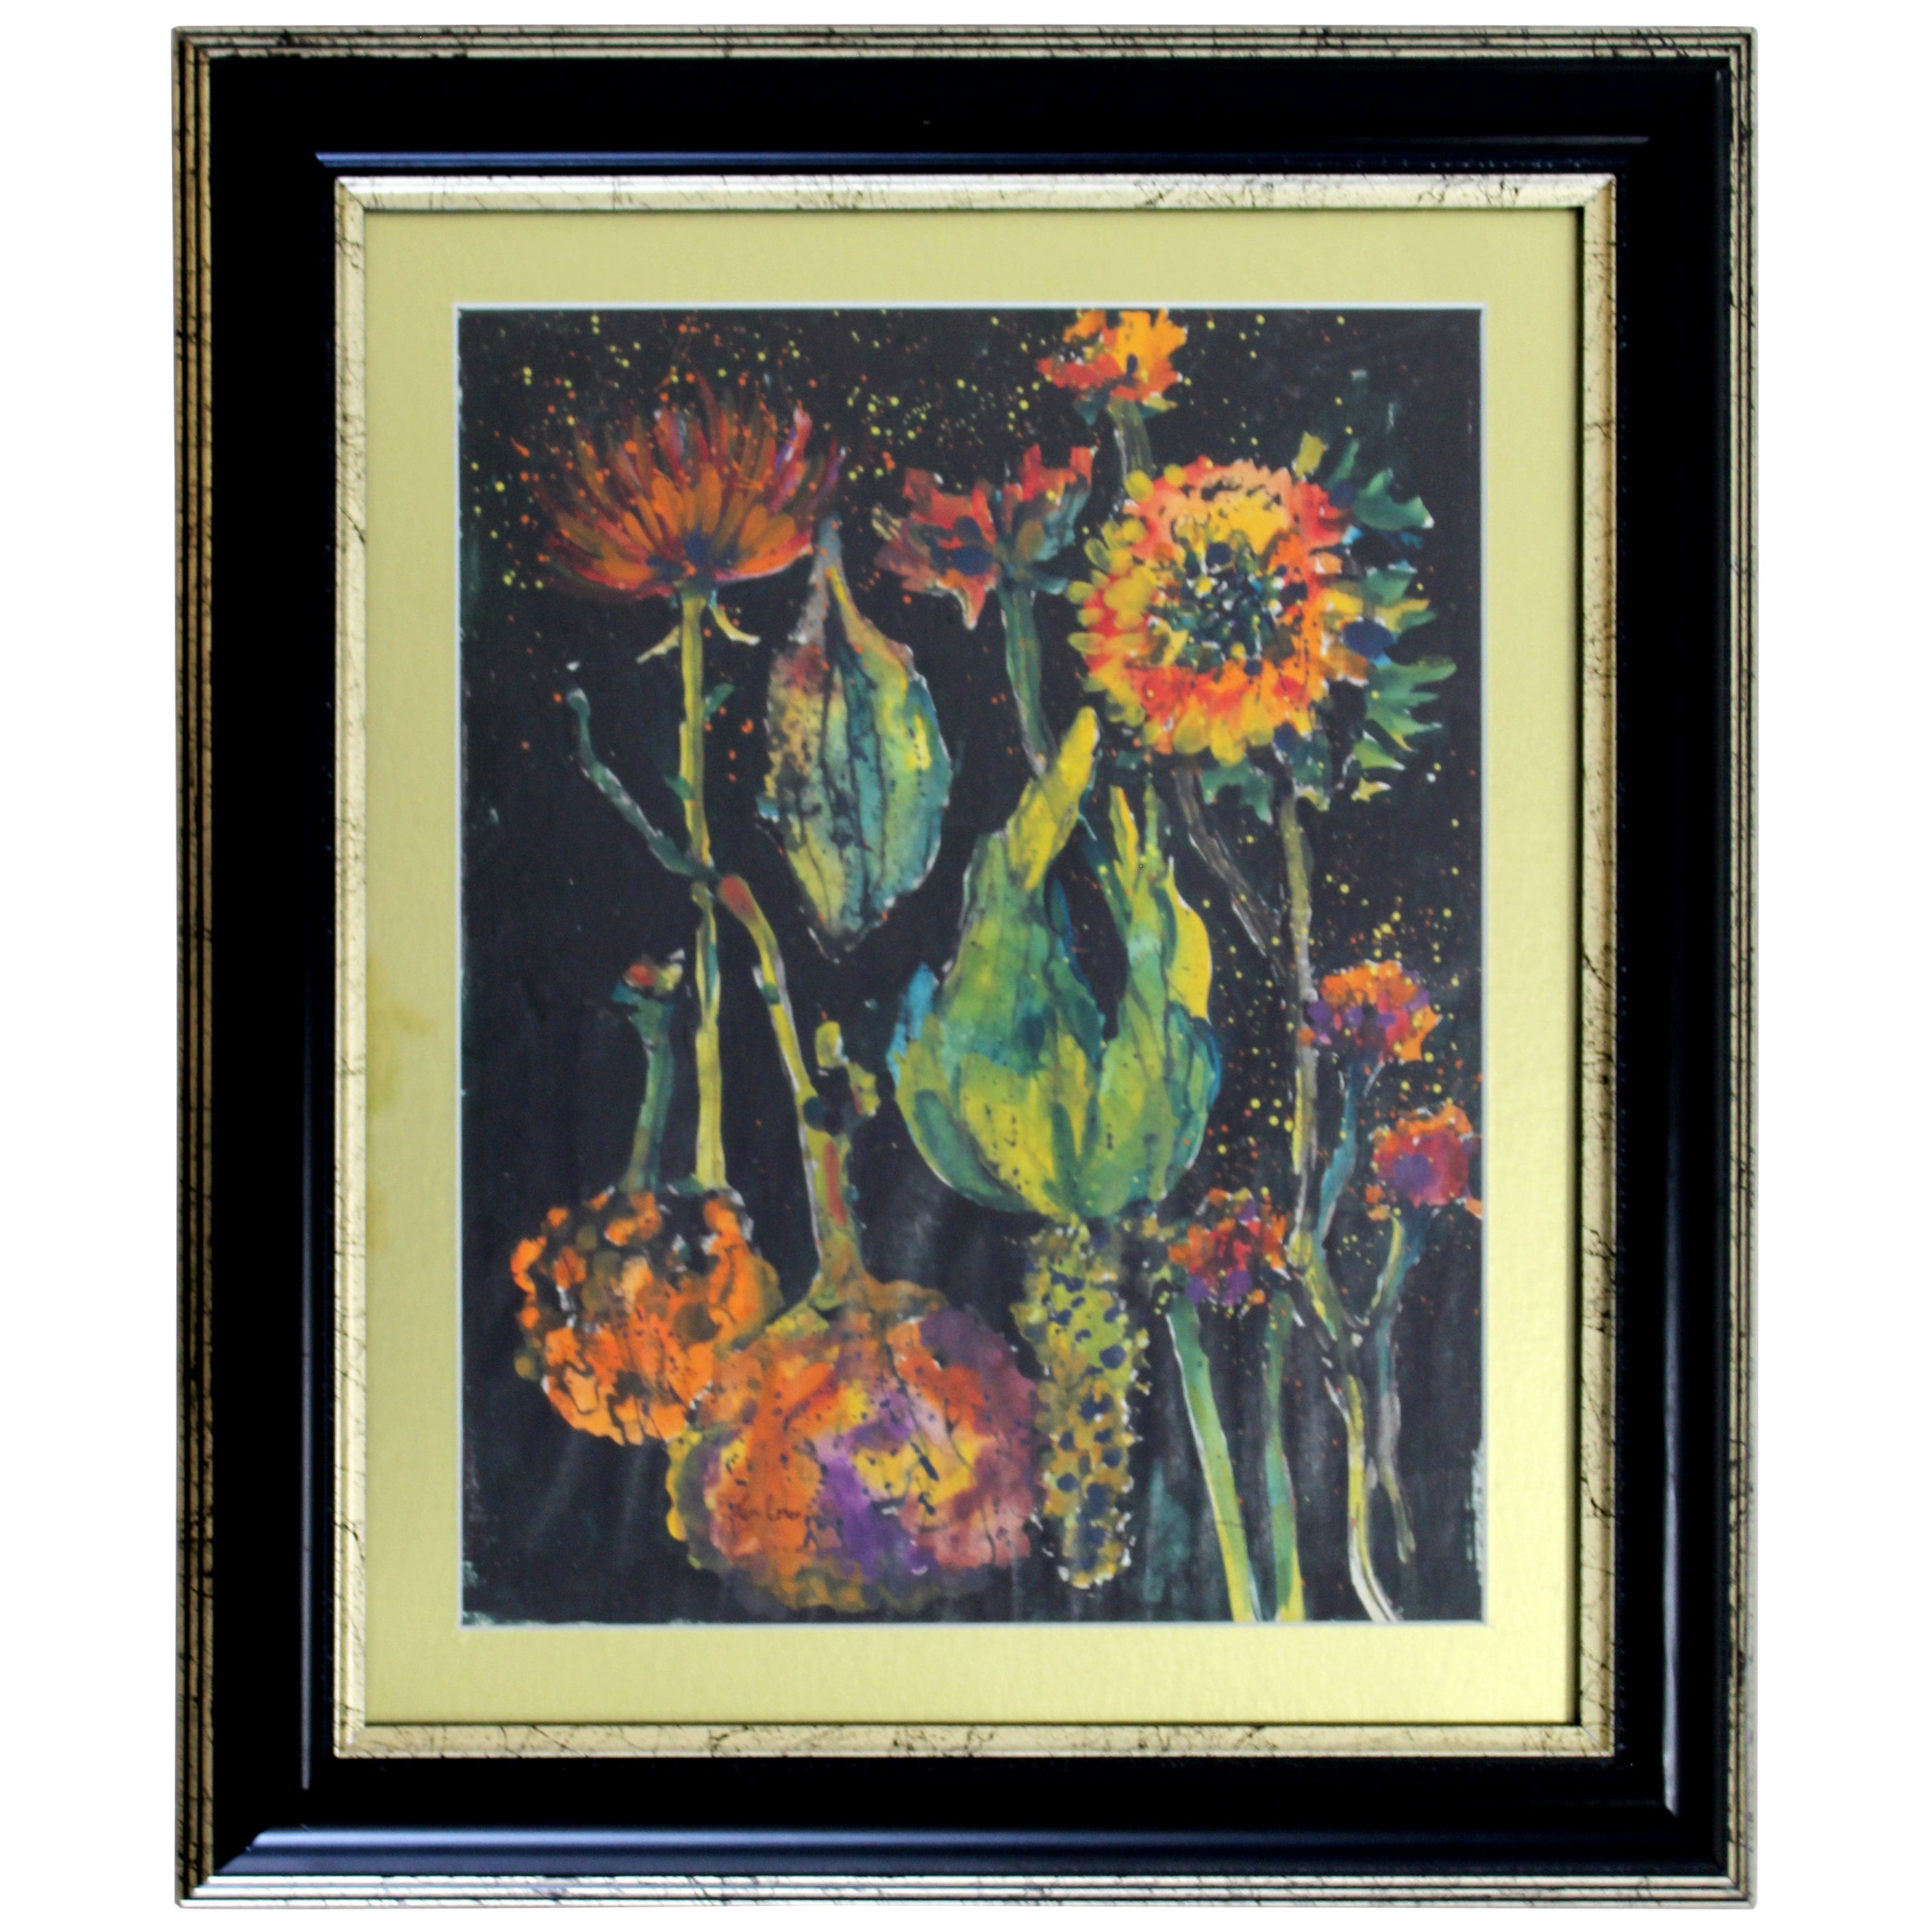 Contemporary John Loree Signed Framed Mixed Media Watercolor Still Life Painting